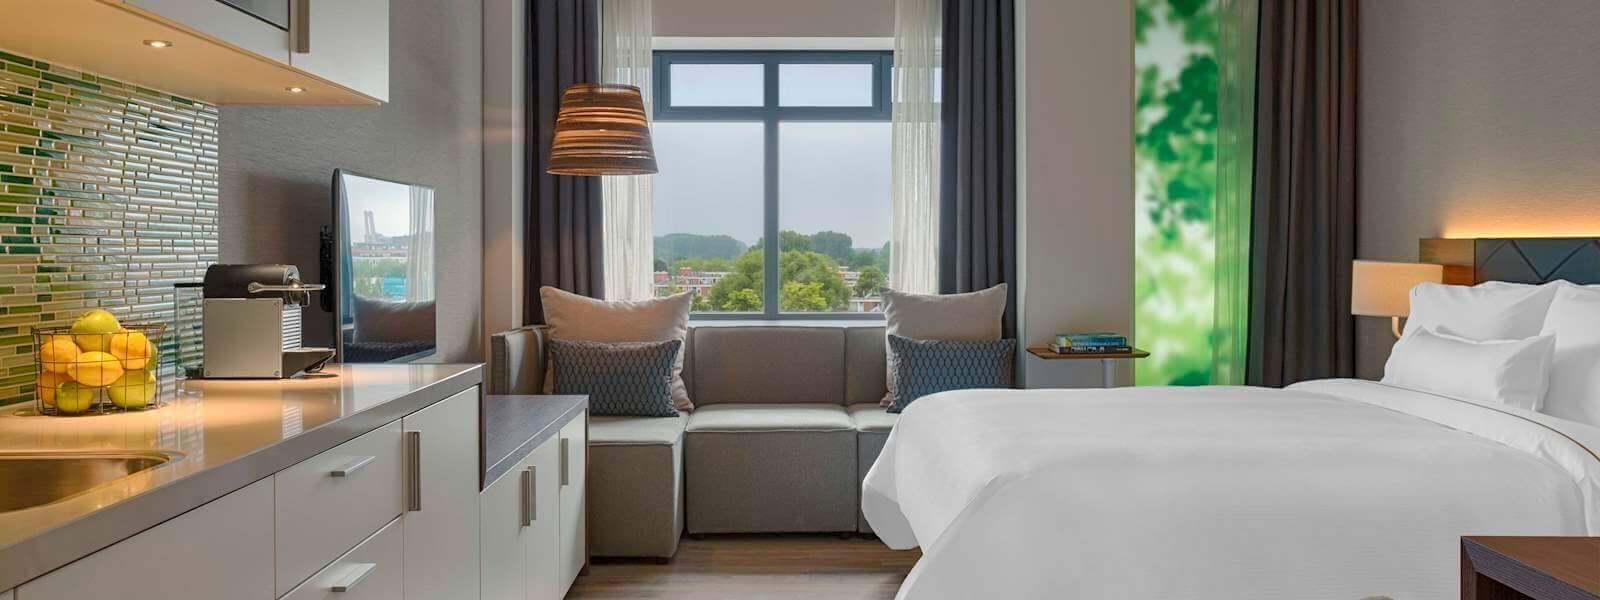 Element Amsterdam Hotel   Lang en kort verblijf   Official Website